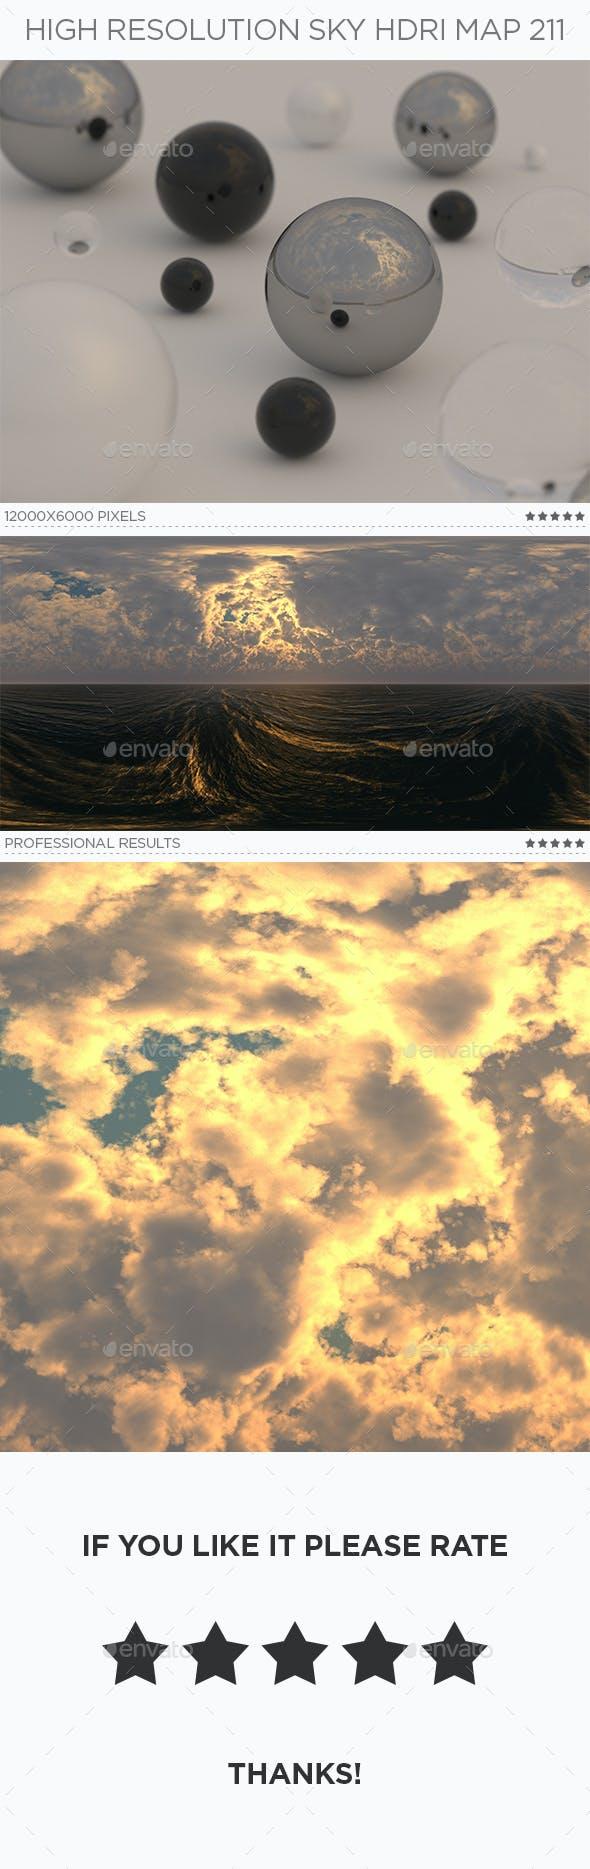 High Resolution Sky HDRi Map 211 - 3DOcean Item for Sale